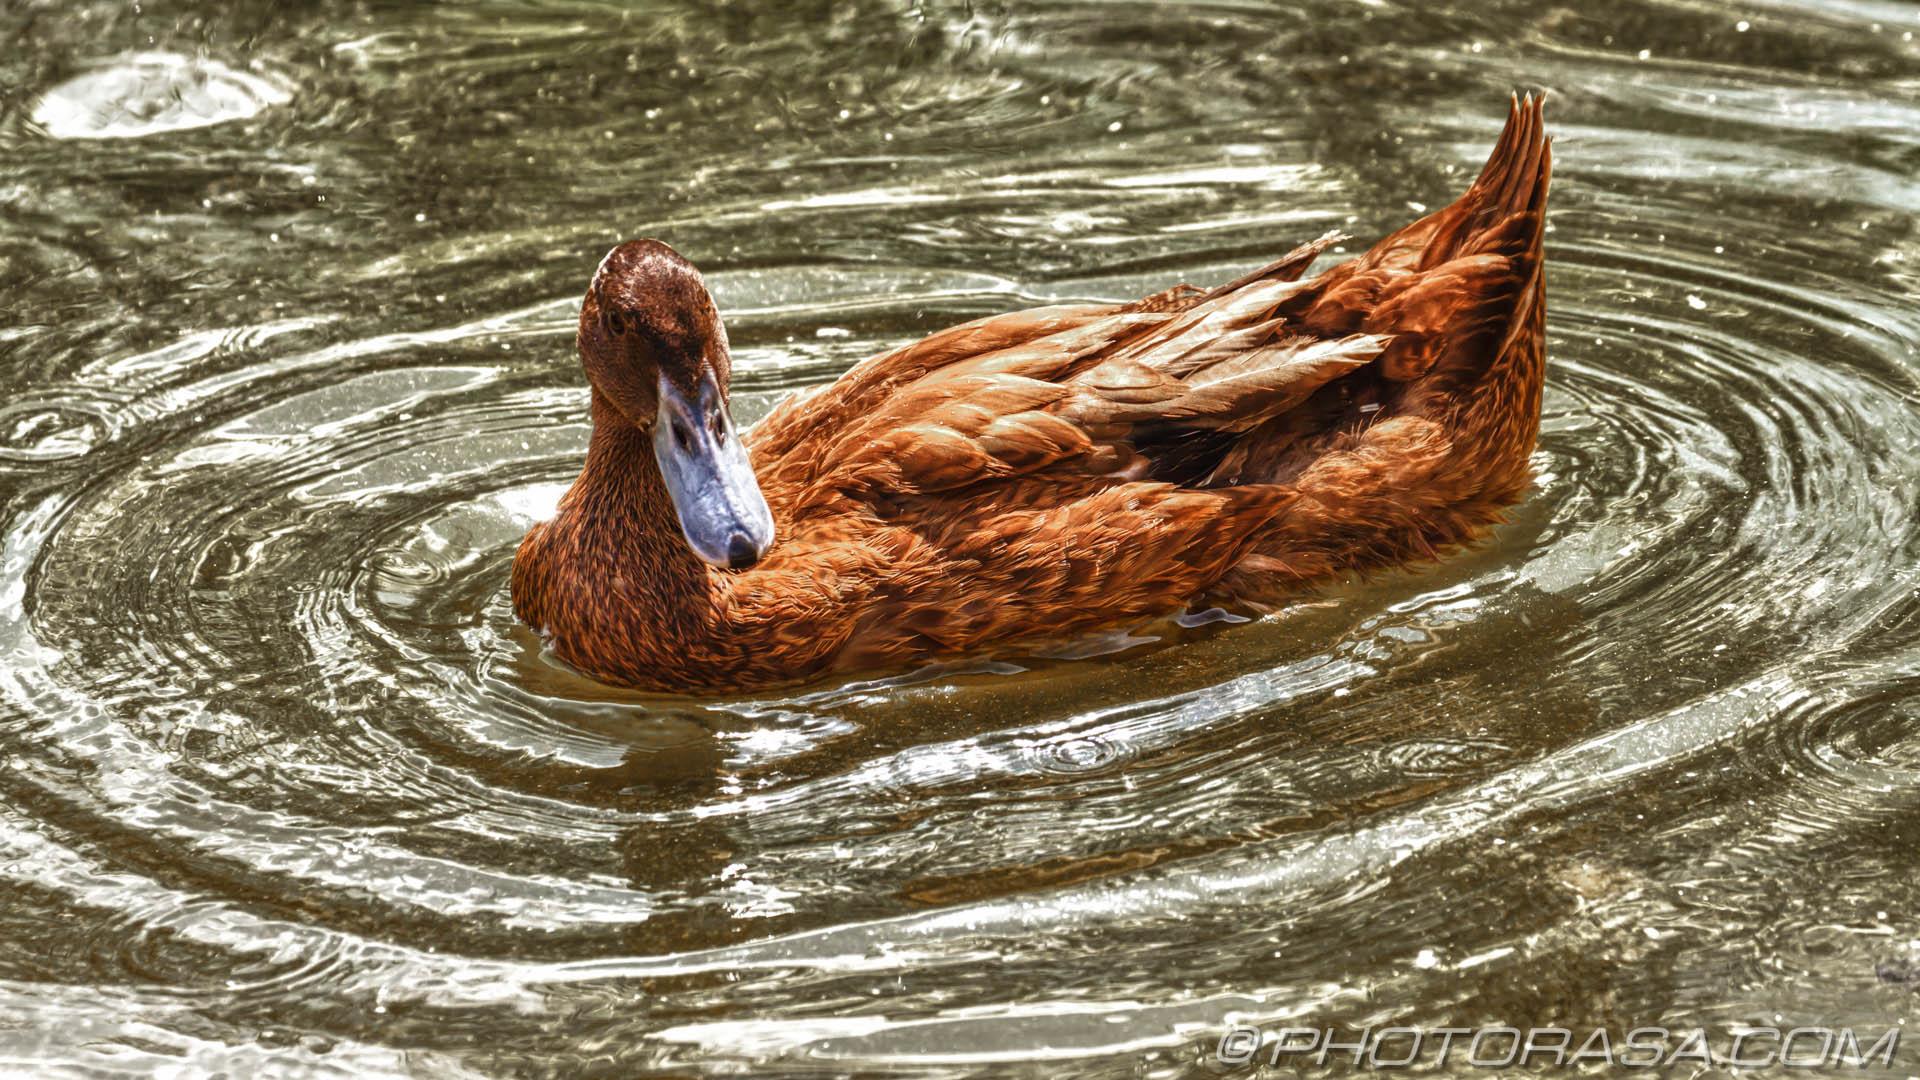 https://photorasa.com/birds-greenworld/hd-brown-duck-in-water-ripple/